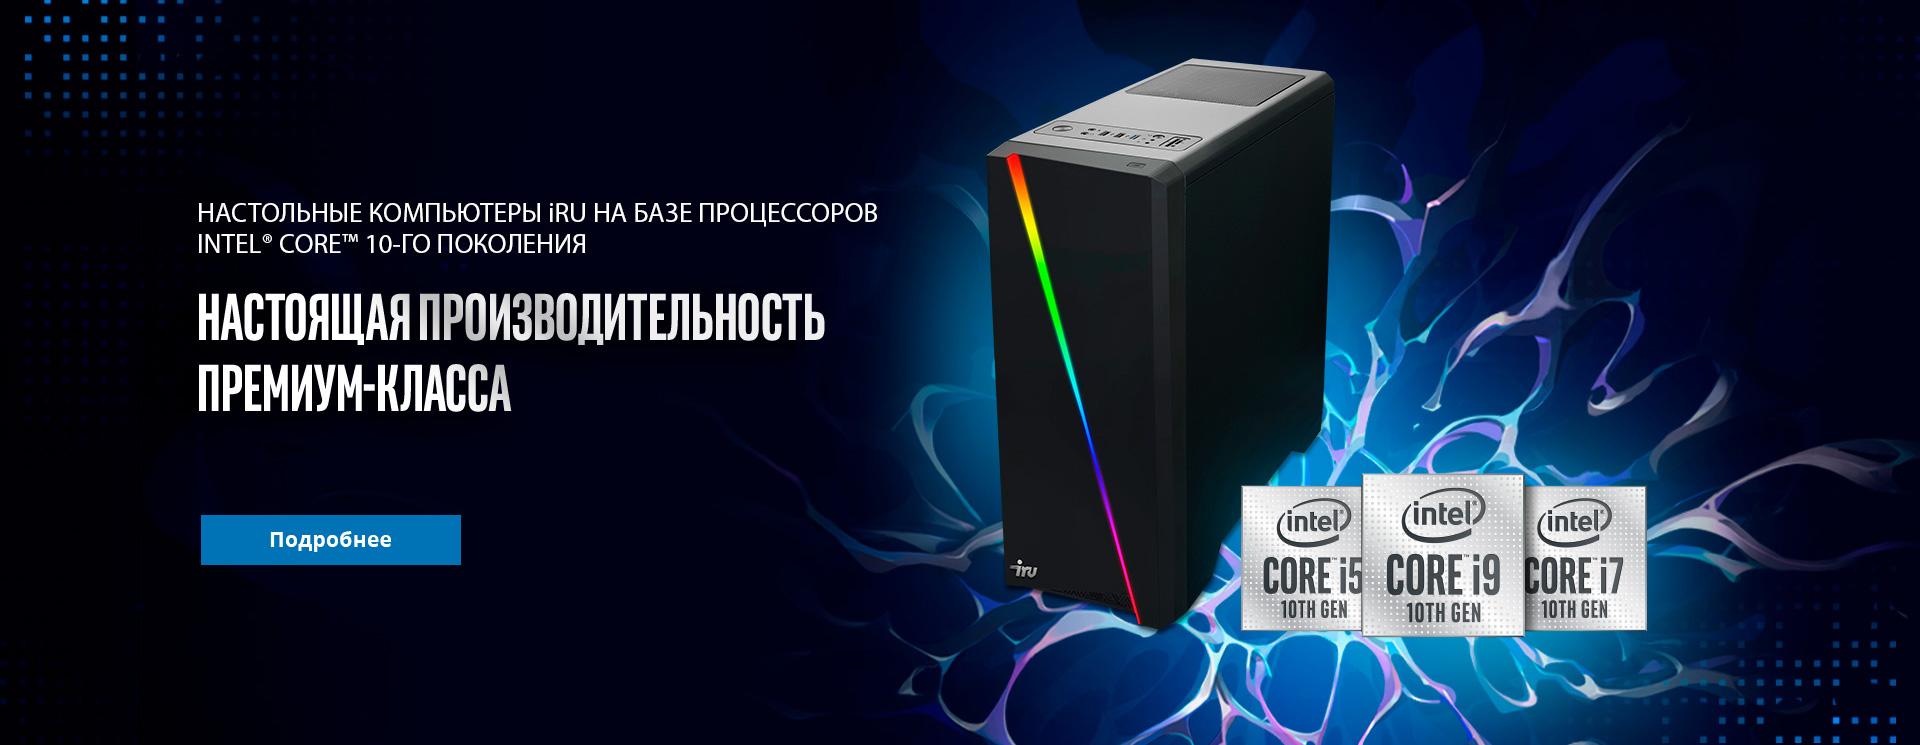 https://static.iru.ru/data/banners/79812_banner_iRU-2